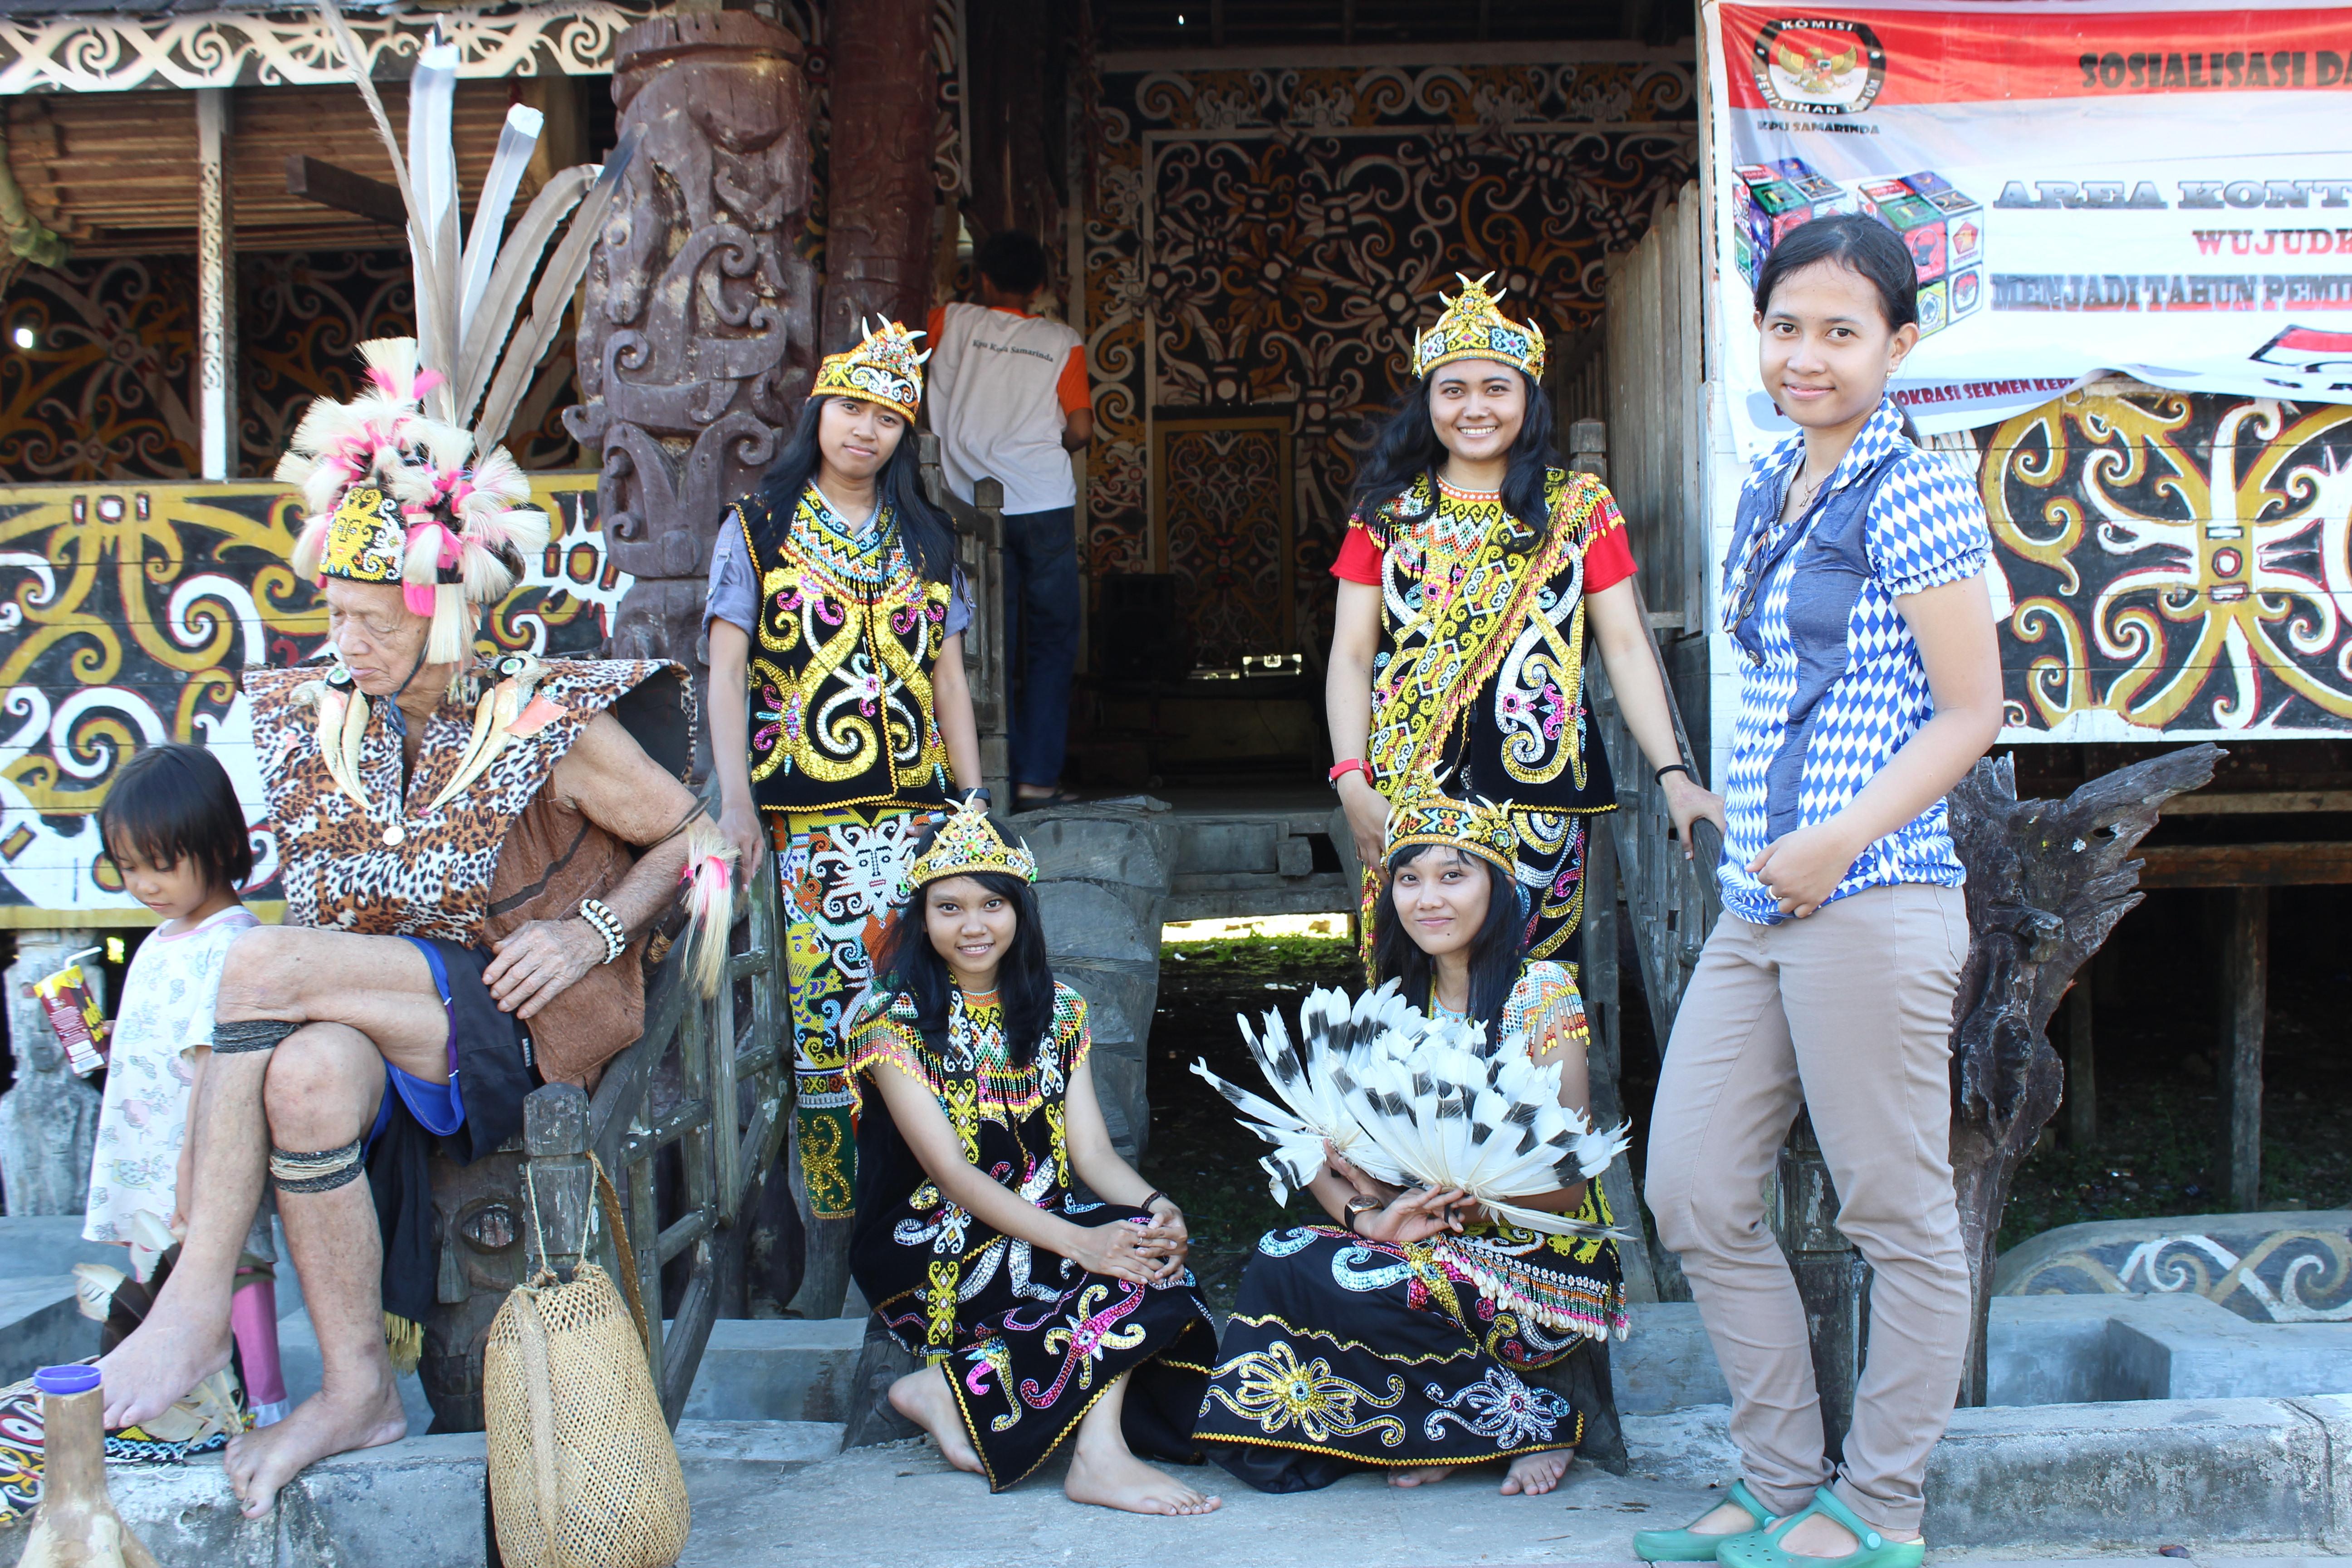 Journey Samarinda Kalimantan Timur Light Joanna Masyarakat Desa Pampang Menjua